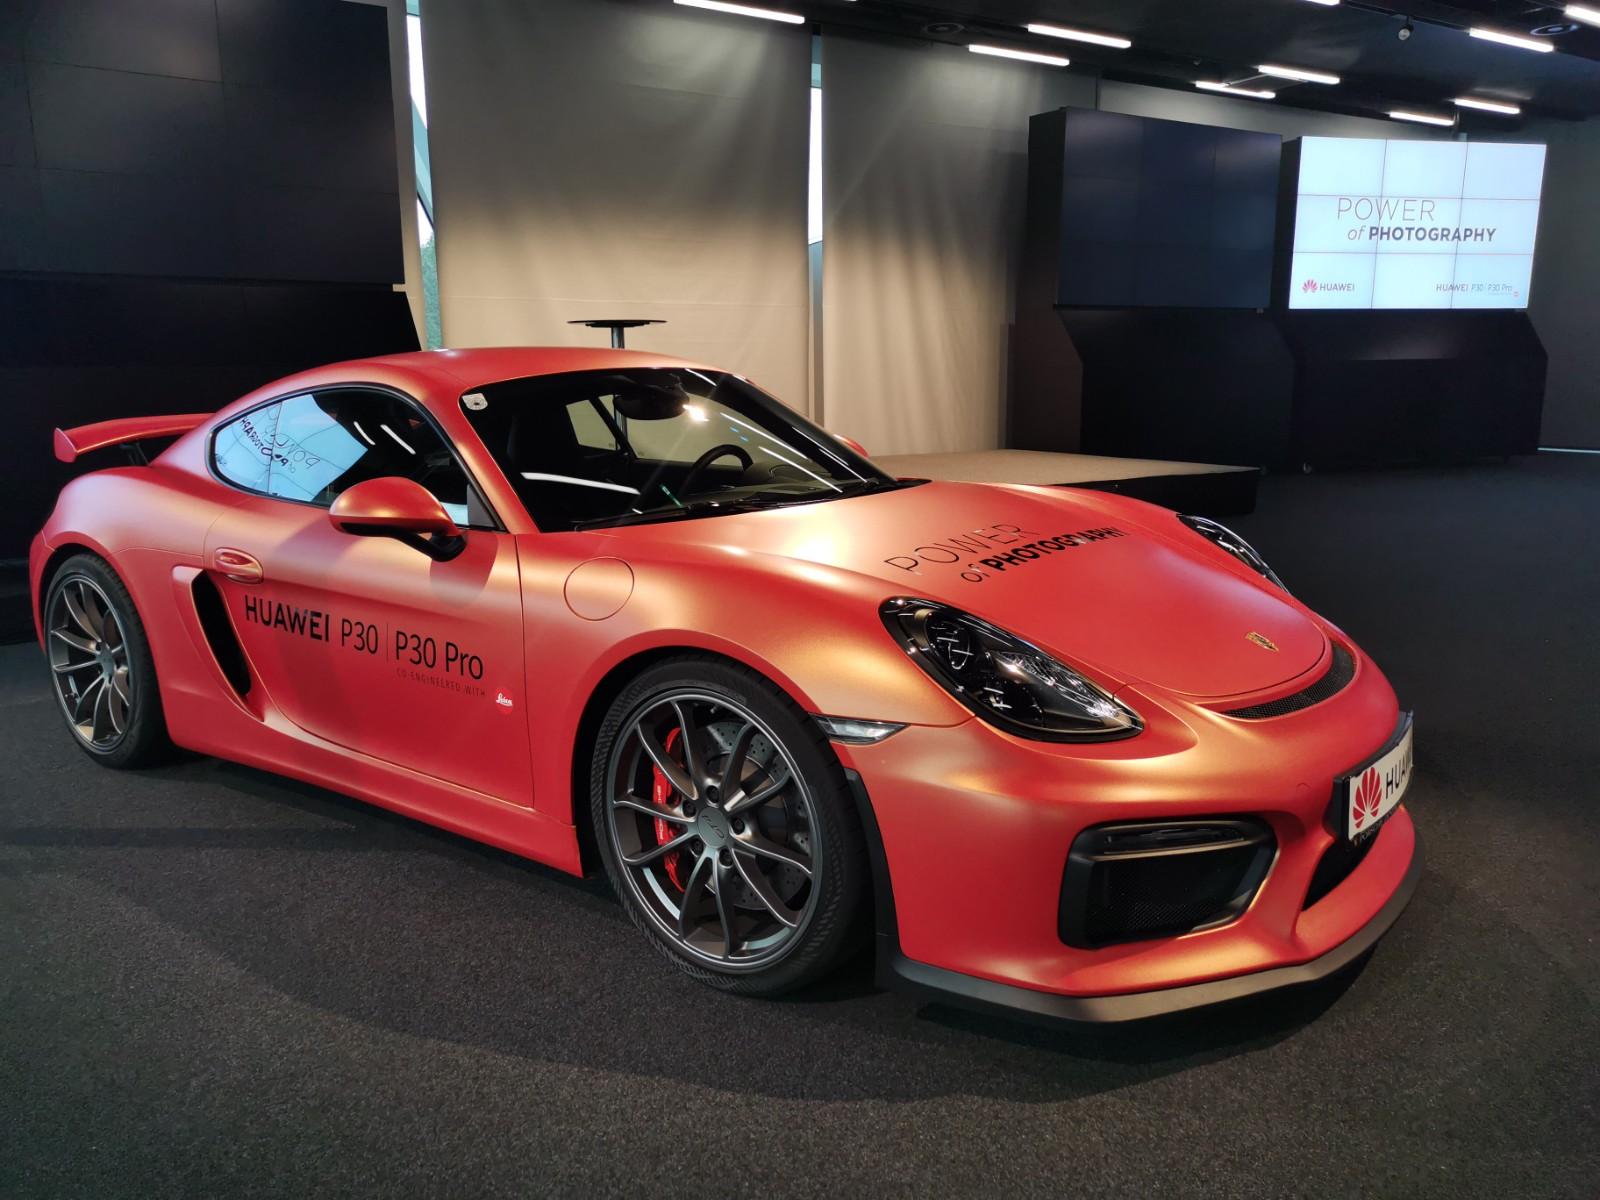 Huawei_Porsche Amber Sunrise 1.png